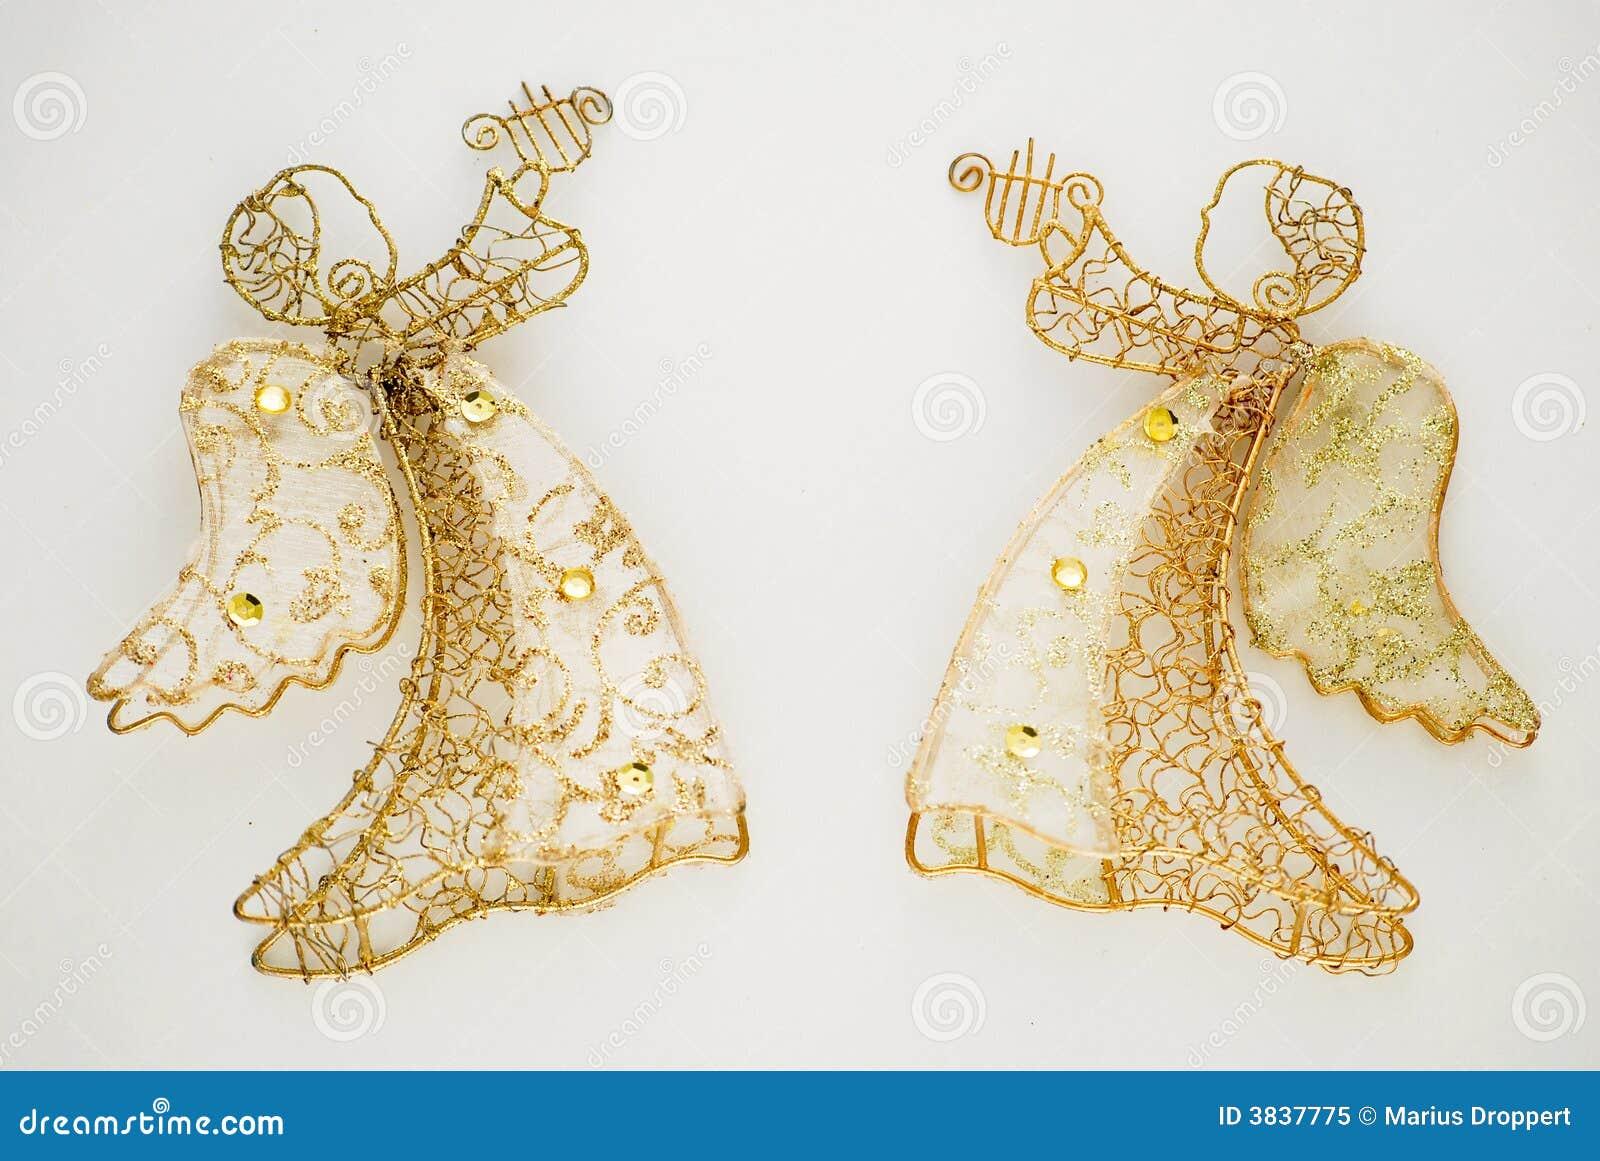 Due angeli dorati